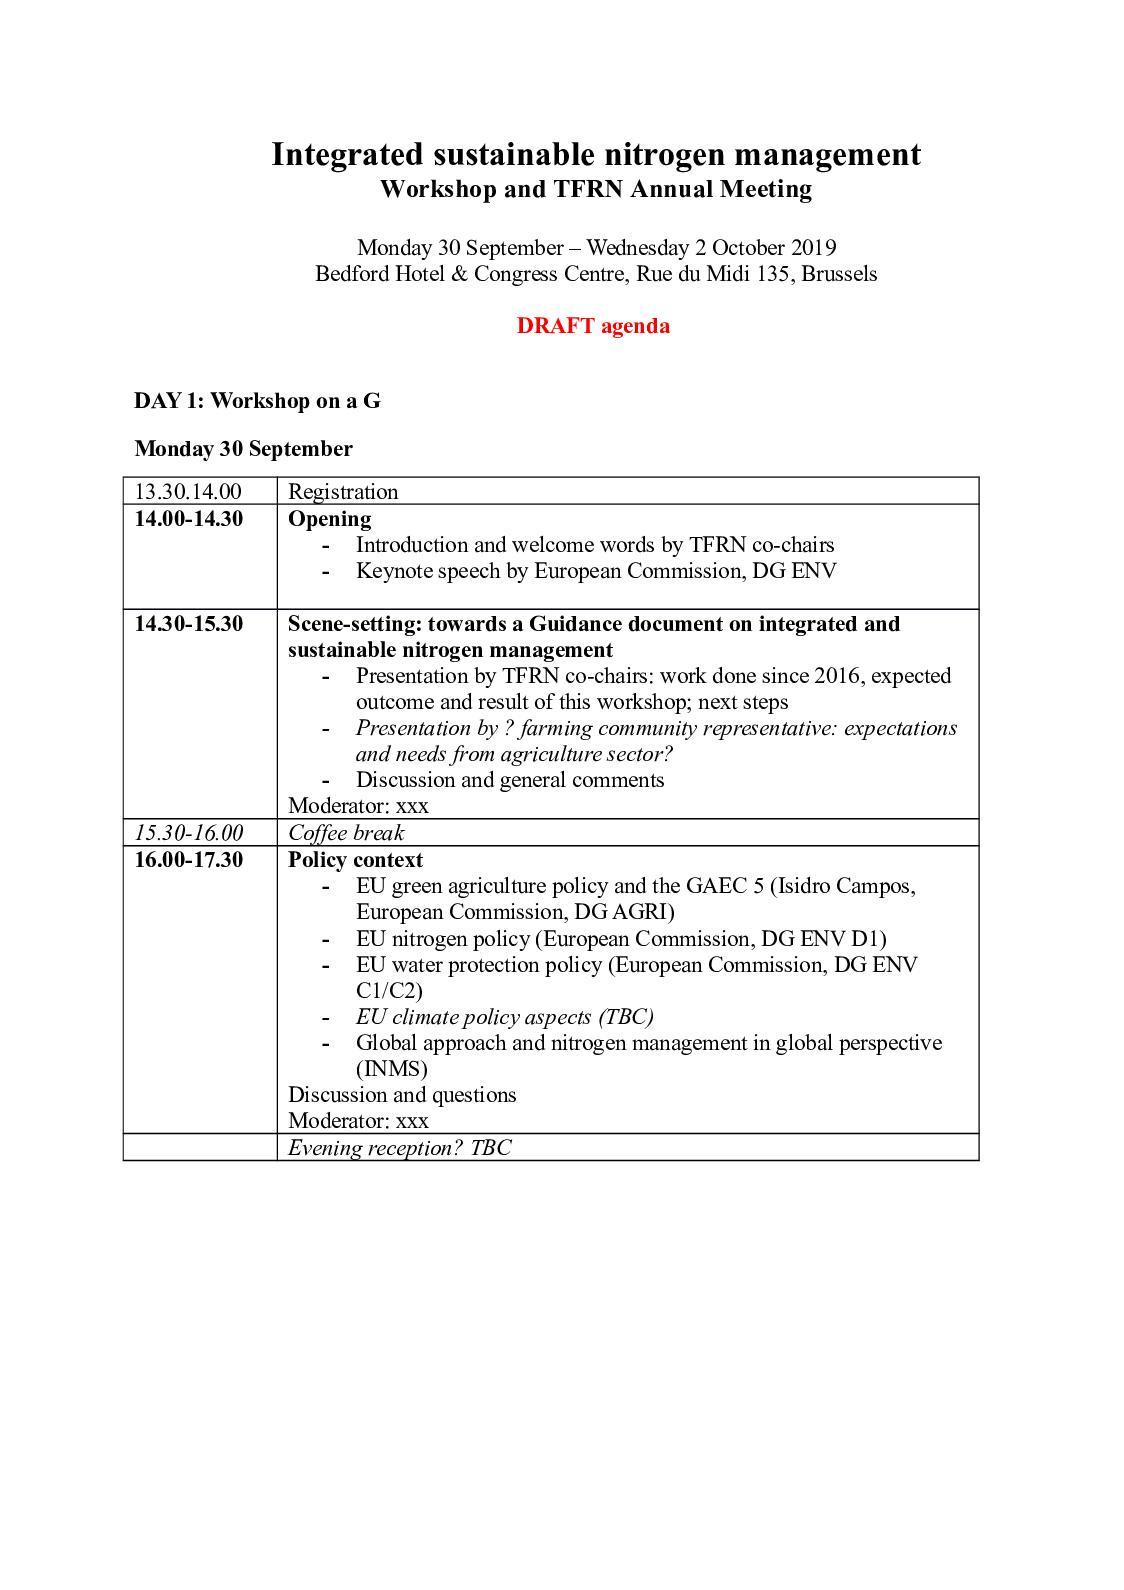 Calaméo - Draft Agenda Nitrogen Workshop 30sep 2oct19